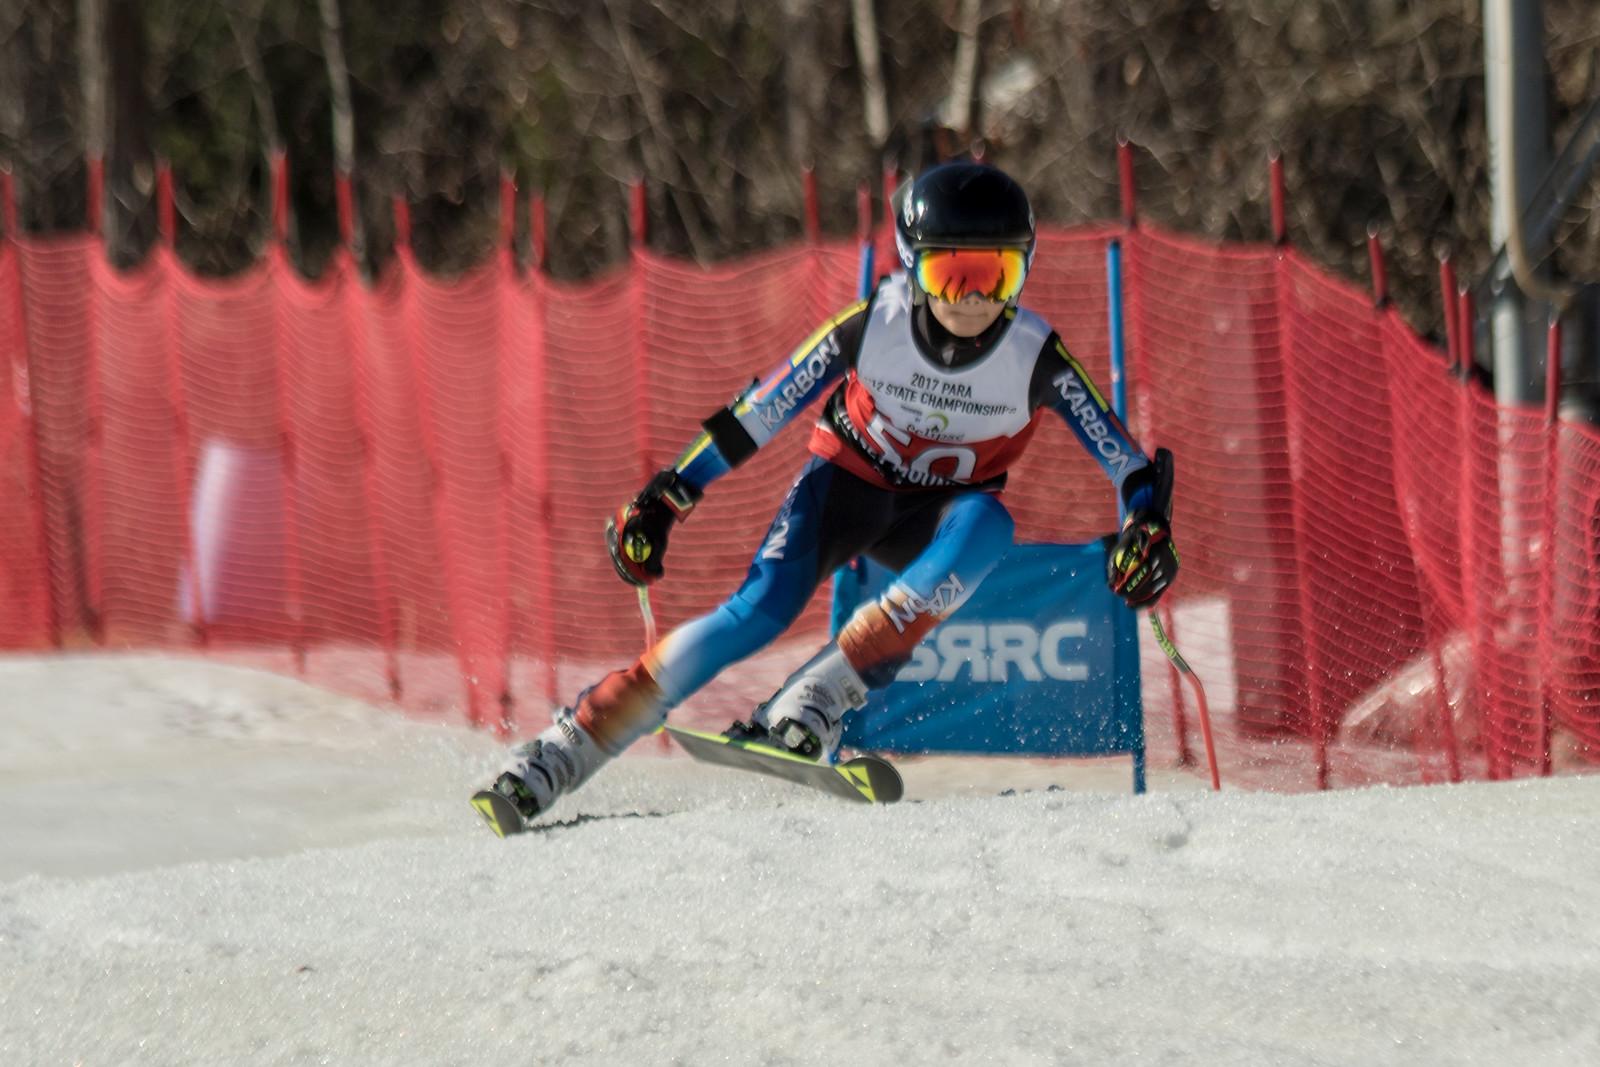 James Dougherty No.50 (BMRA) 2017 PARA U12 State Championships at Roundtop Mountain Resort